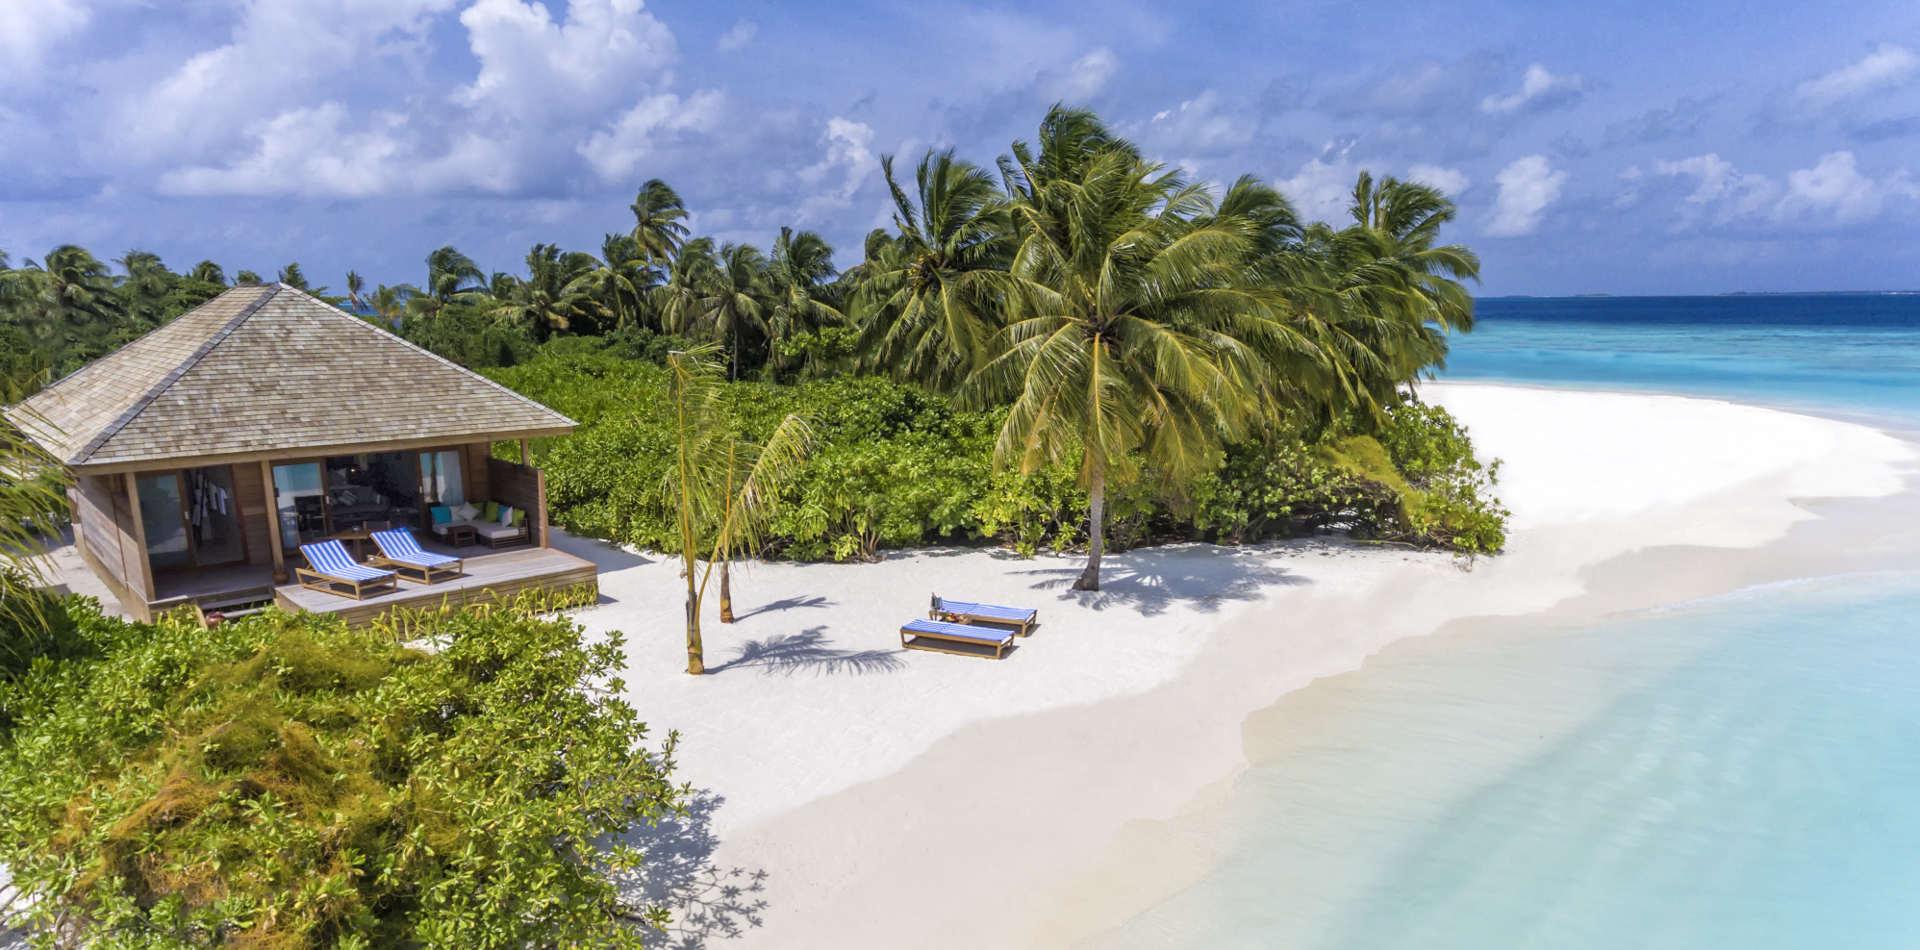 Luxusreise Malediven, Individualreise Malediven